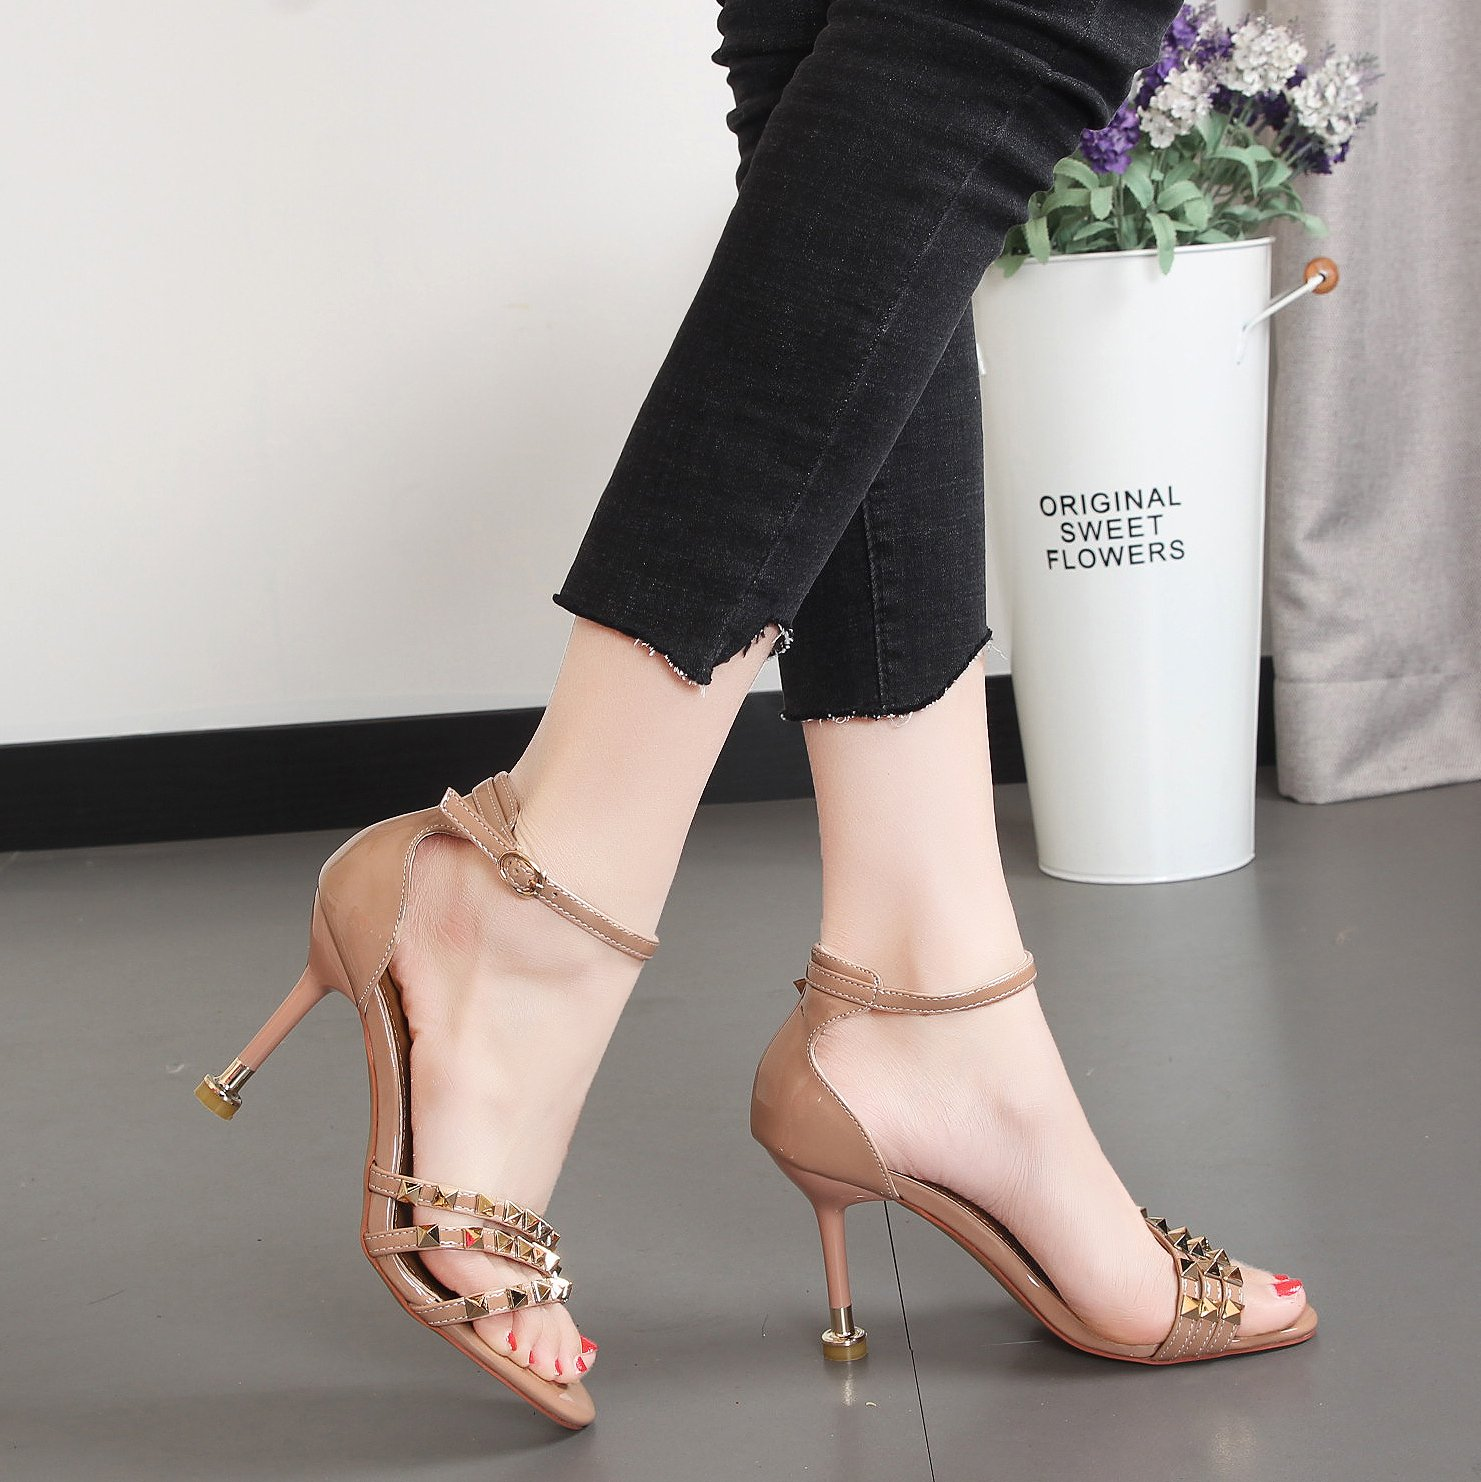 Xue Qiqi Nacht Tau - Niet hochhackigen Sandalen Sandalen Sandalen weiblichen fein mit Pin back strap Damen Schuhe a5e8e8